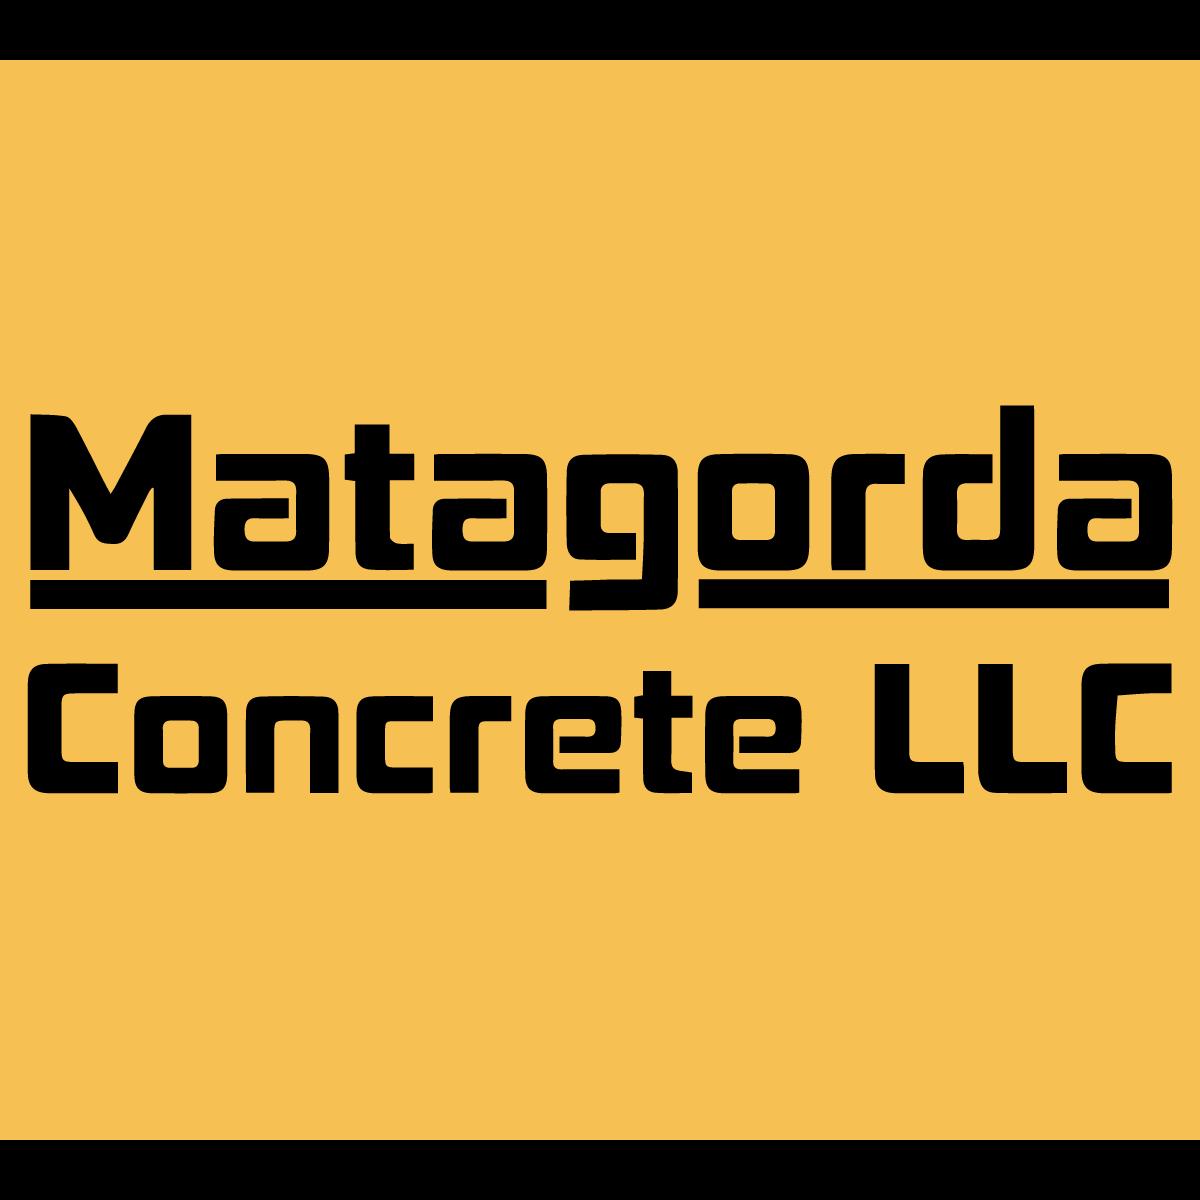 Matagorda Concrete LLC image 0